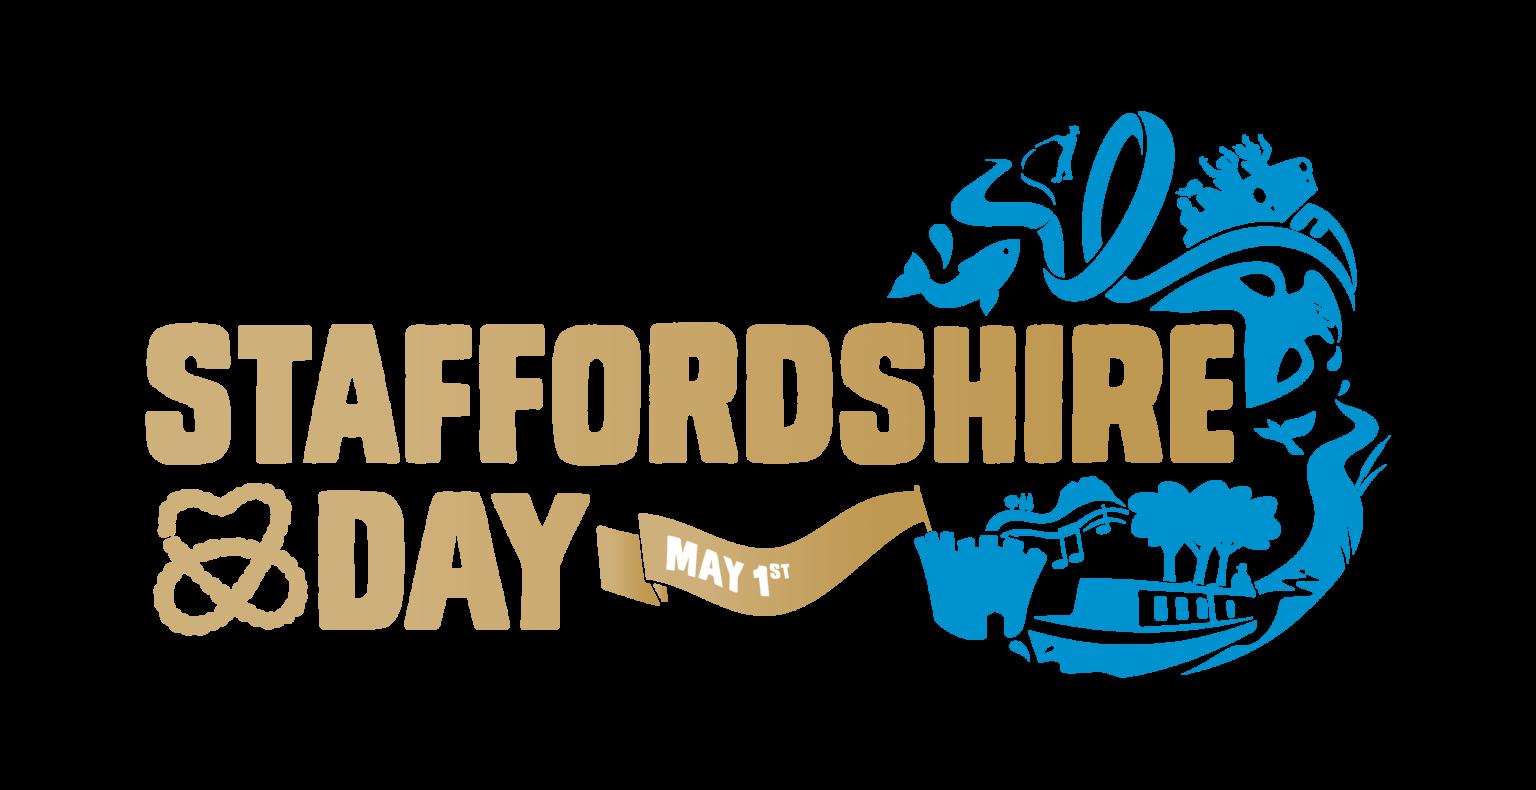 Staffordshire Day